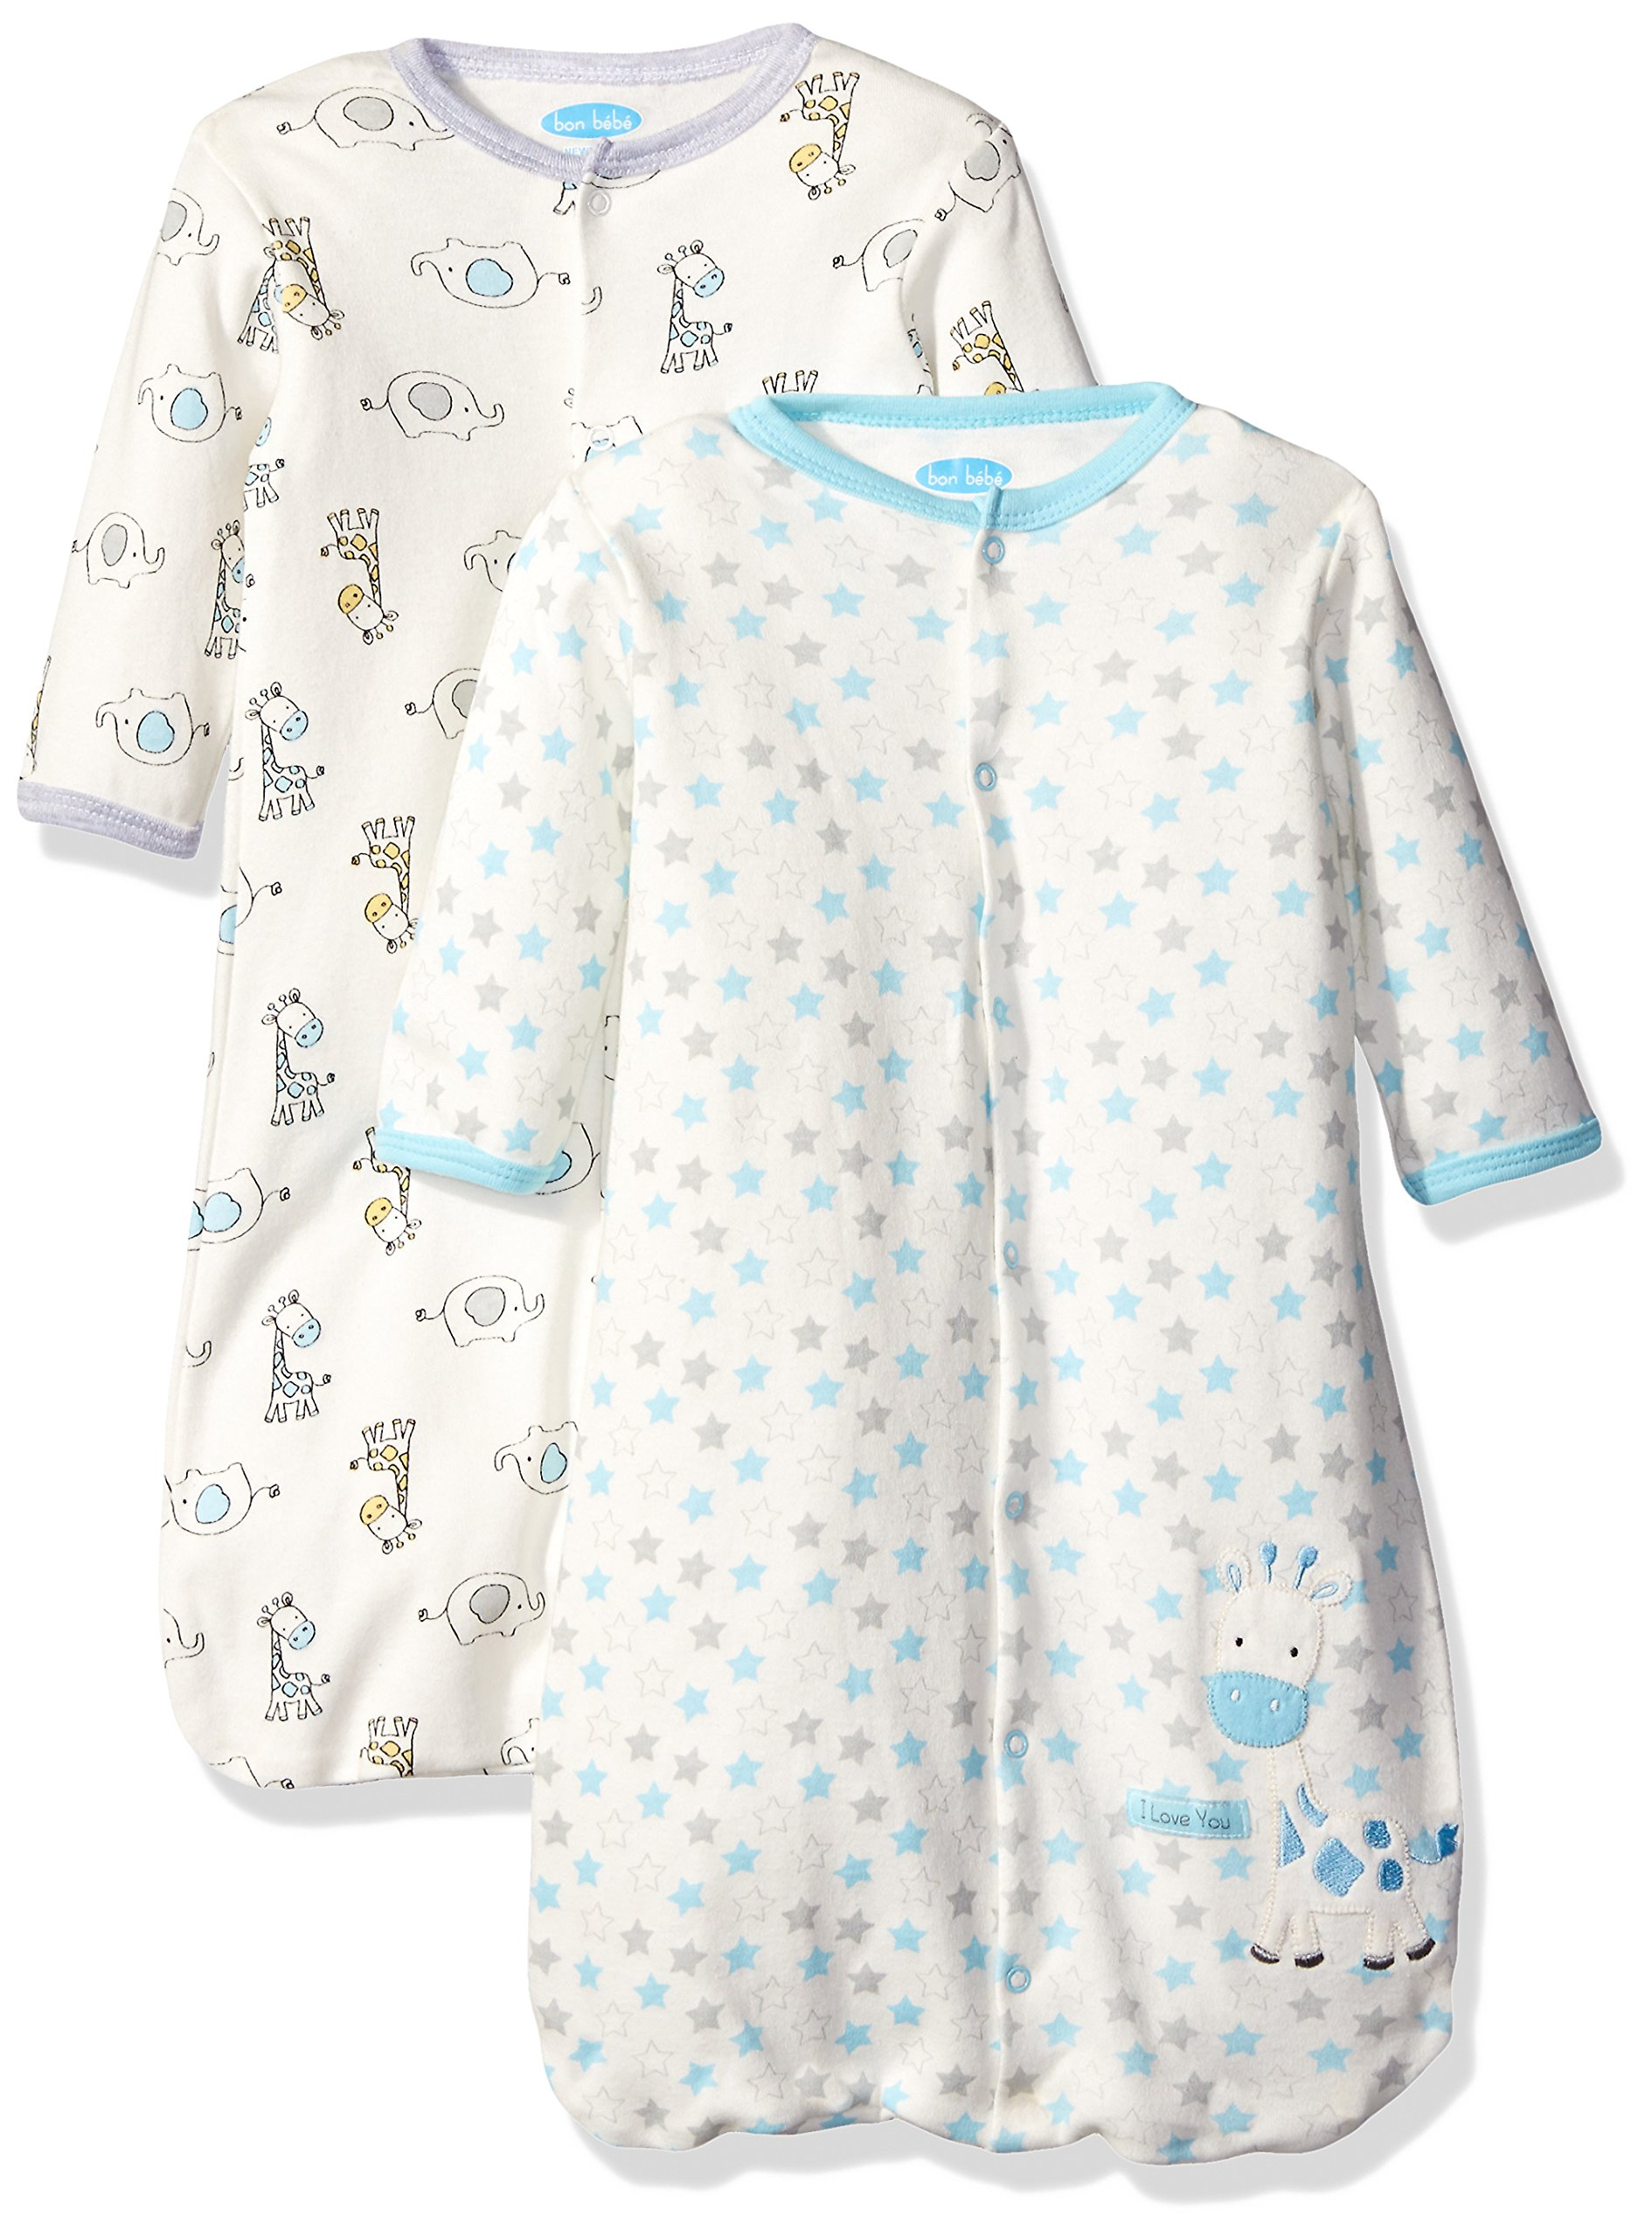 Bon Bebe Baby Best Friends Assorted 2 Pack Wearable Blanket, Neutral, 0-6 Months